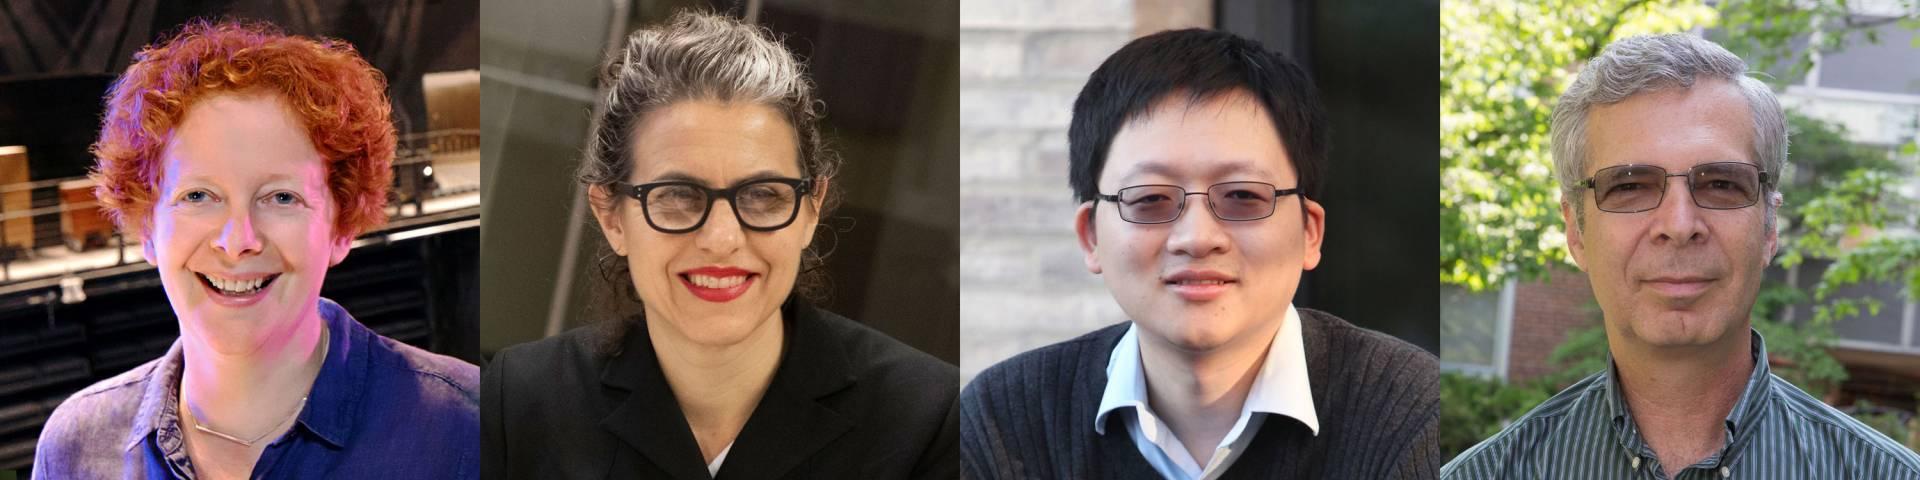 Jane Cox, Marina Rustow, Minjie Chen and Peter Jaffe